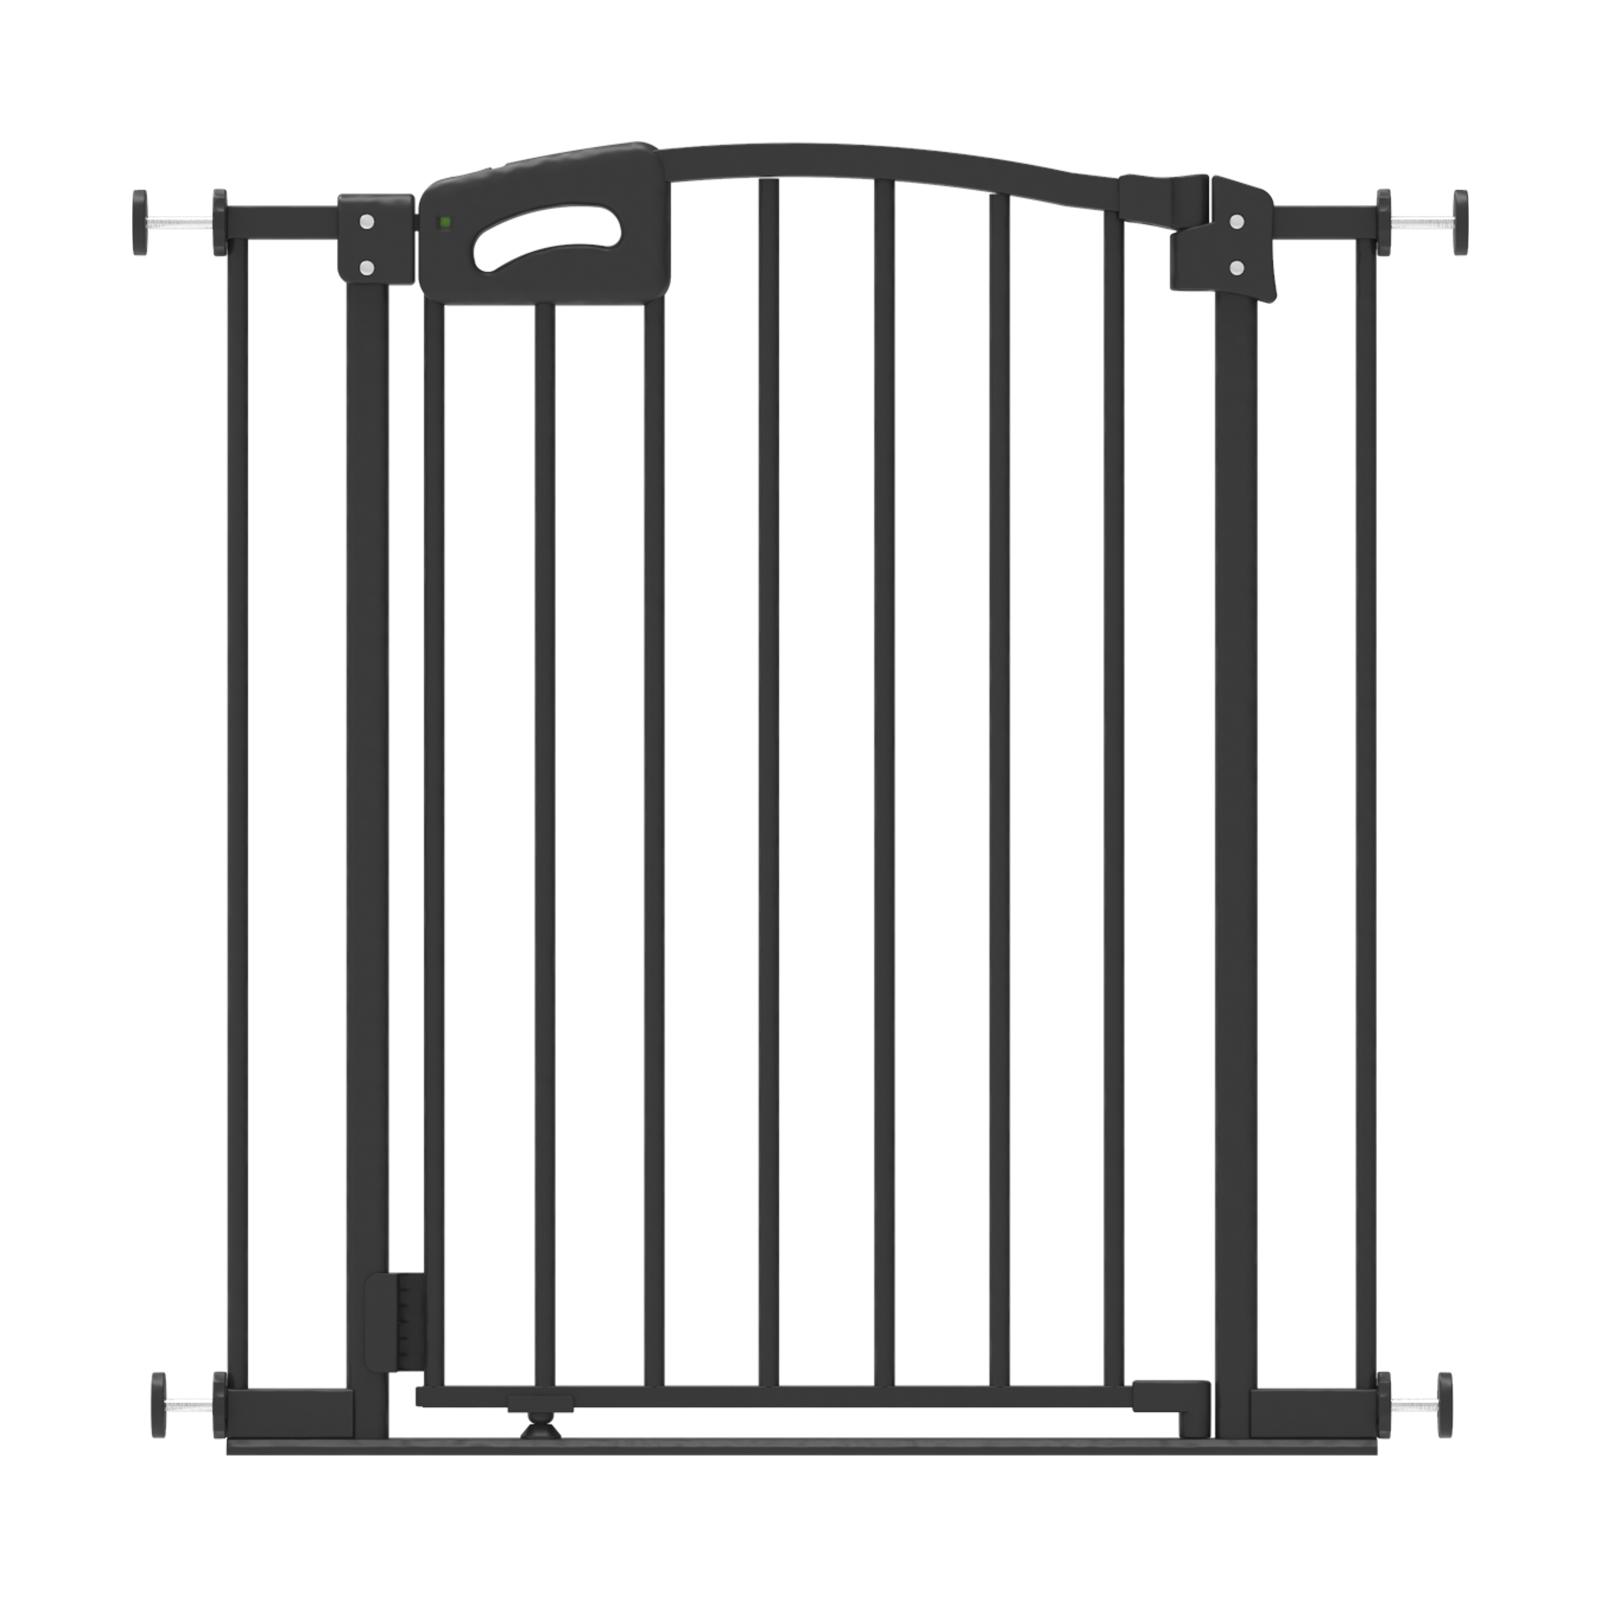 Perma Child Safety Warm Black Ultimate Safety Gate